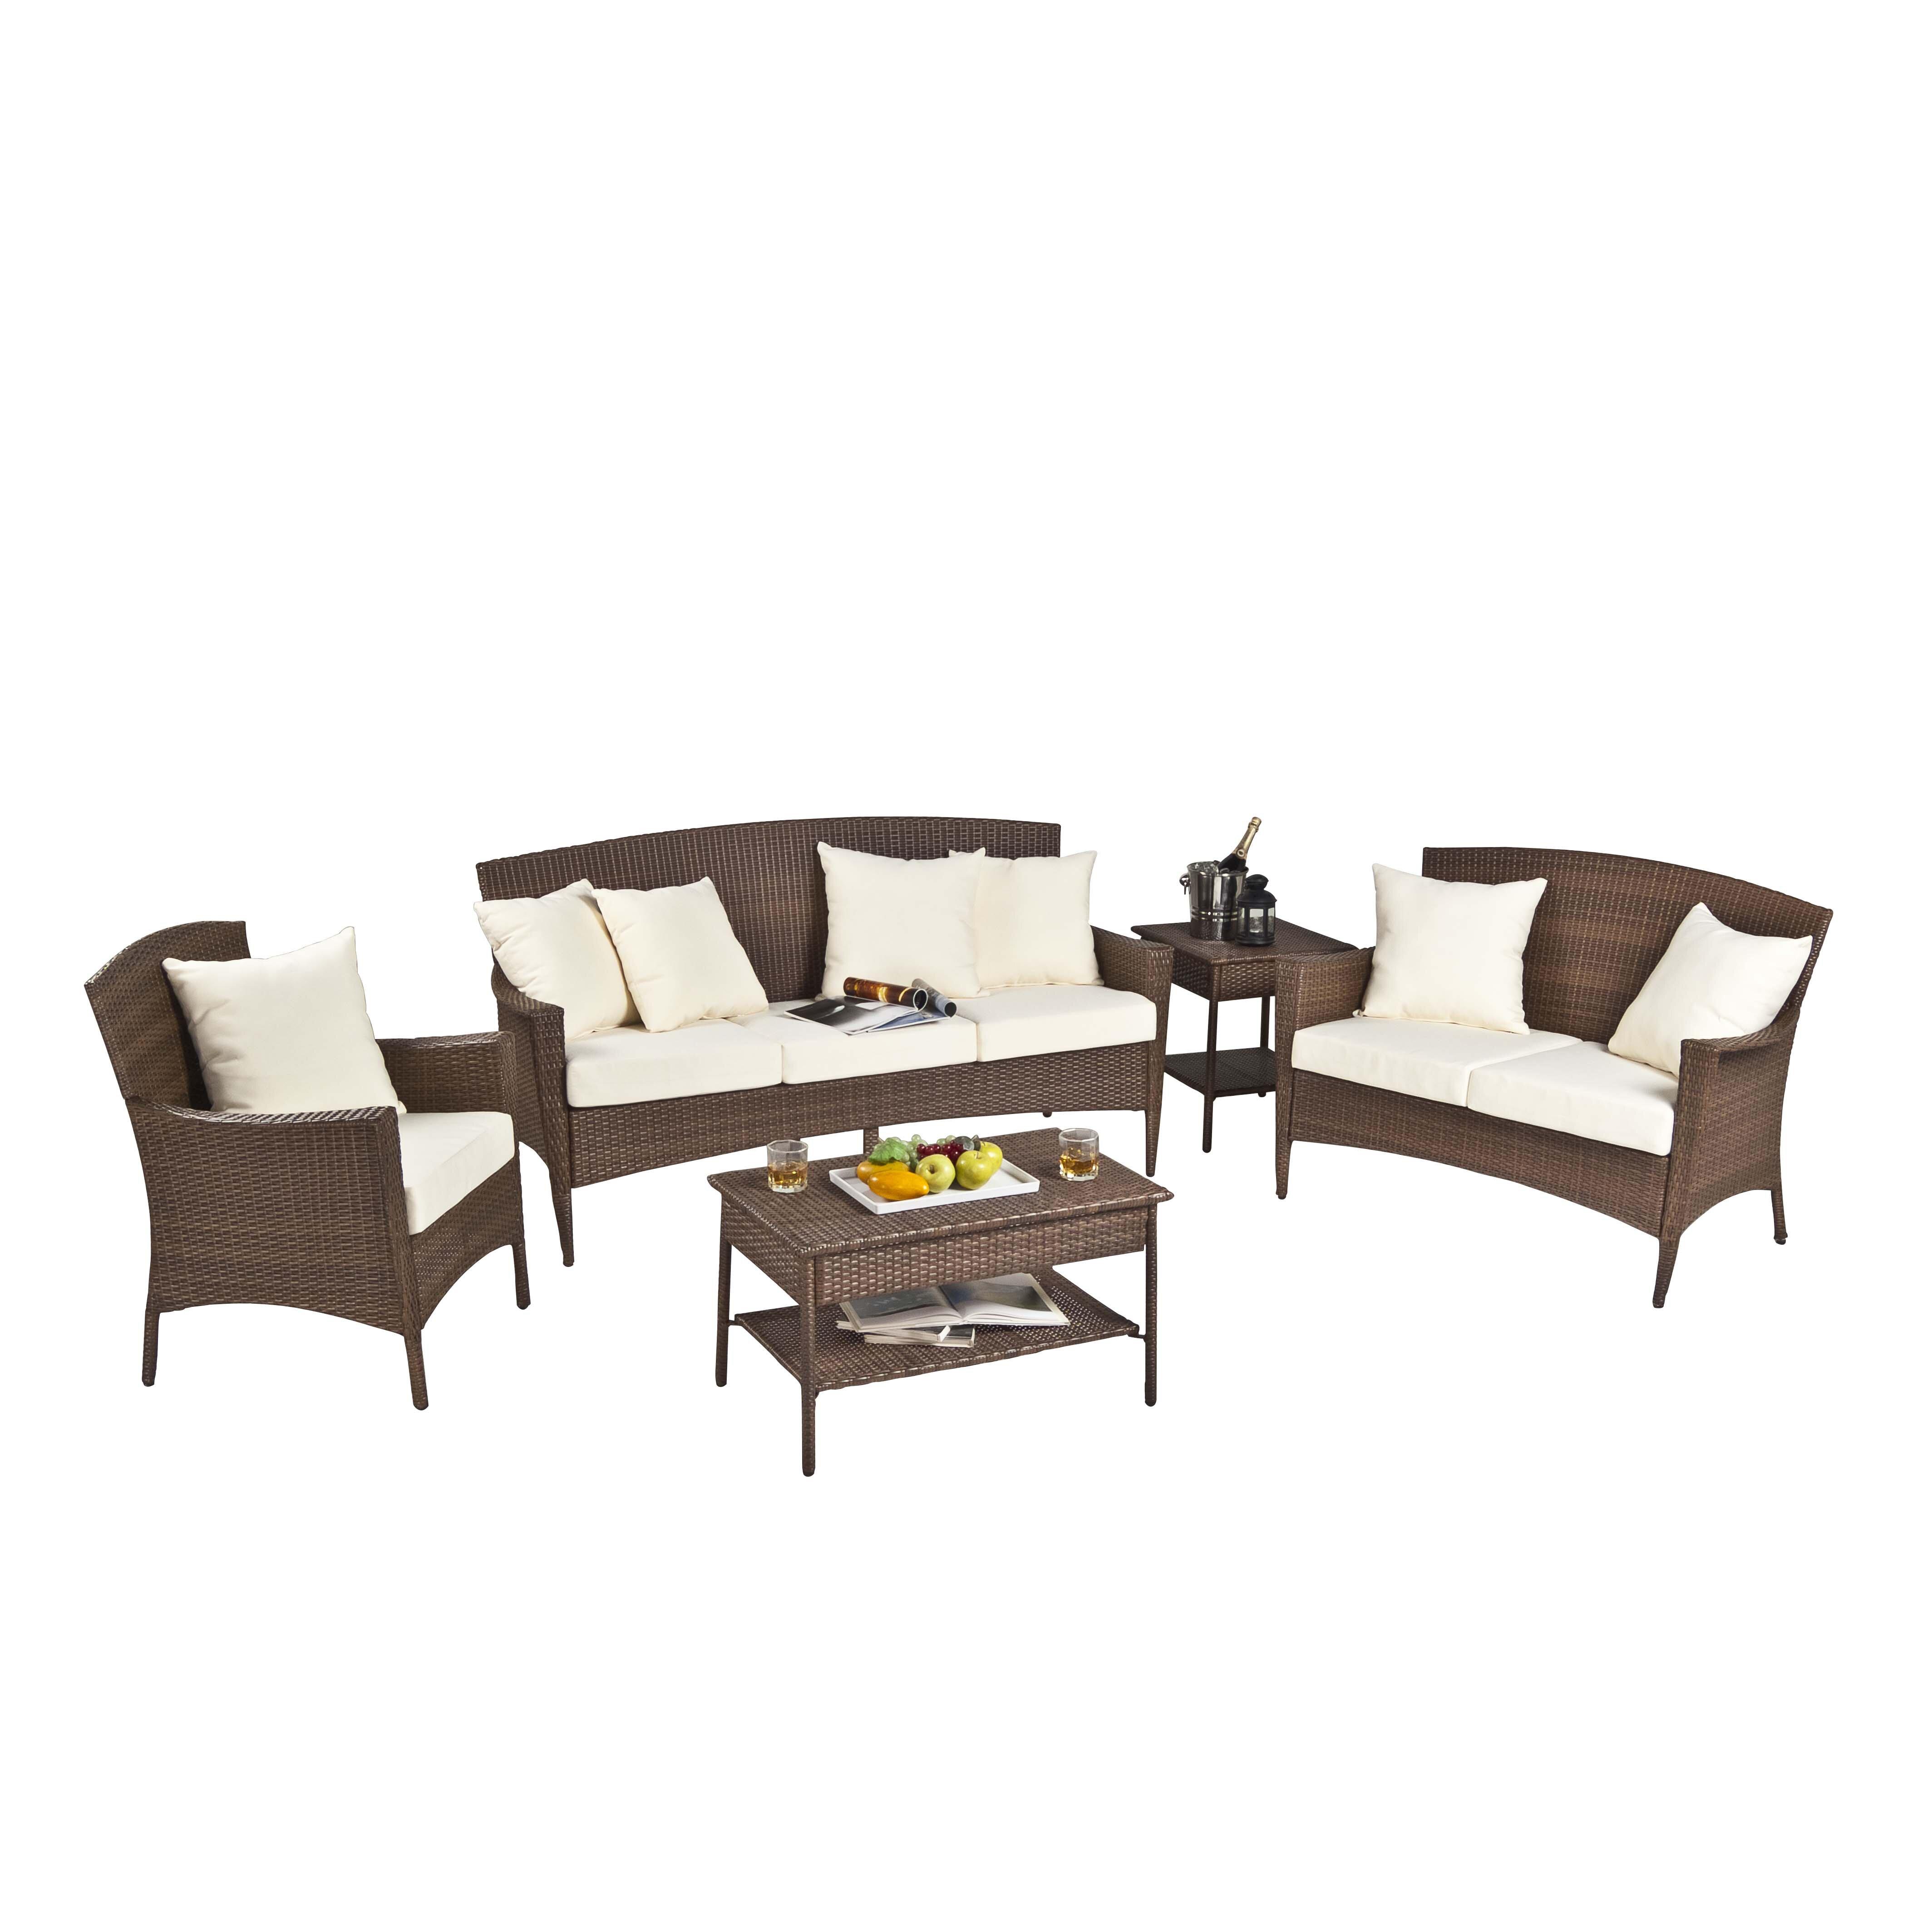 Panama Jack Bedroom Furniture Panama Jack Furniture Collection Rooms To Go